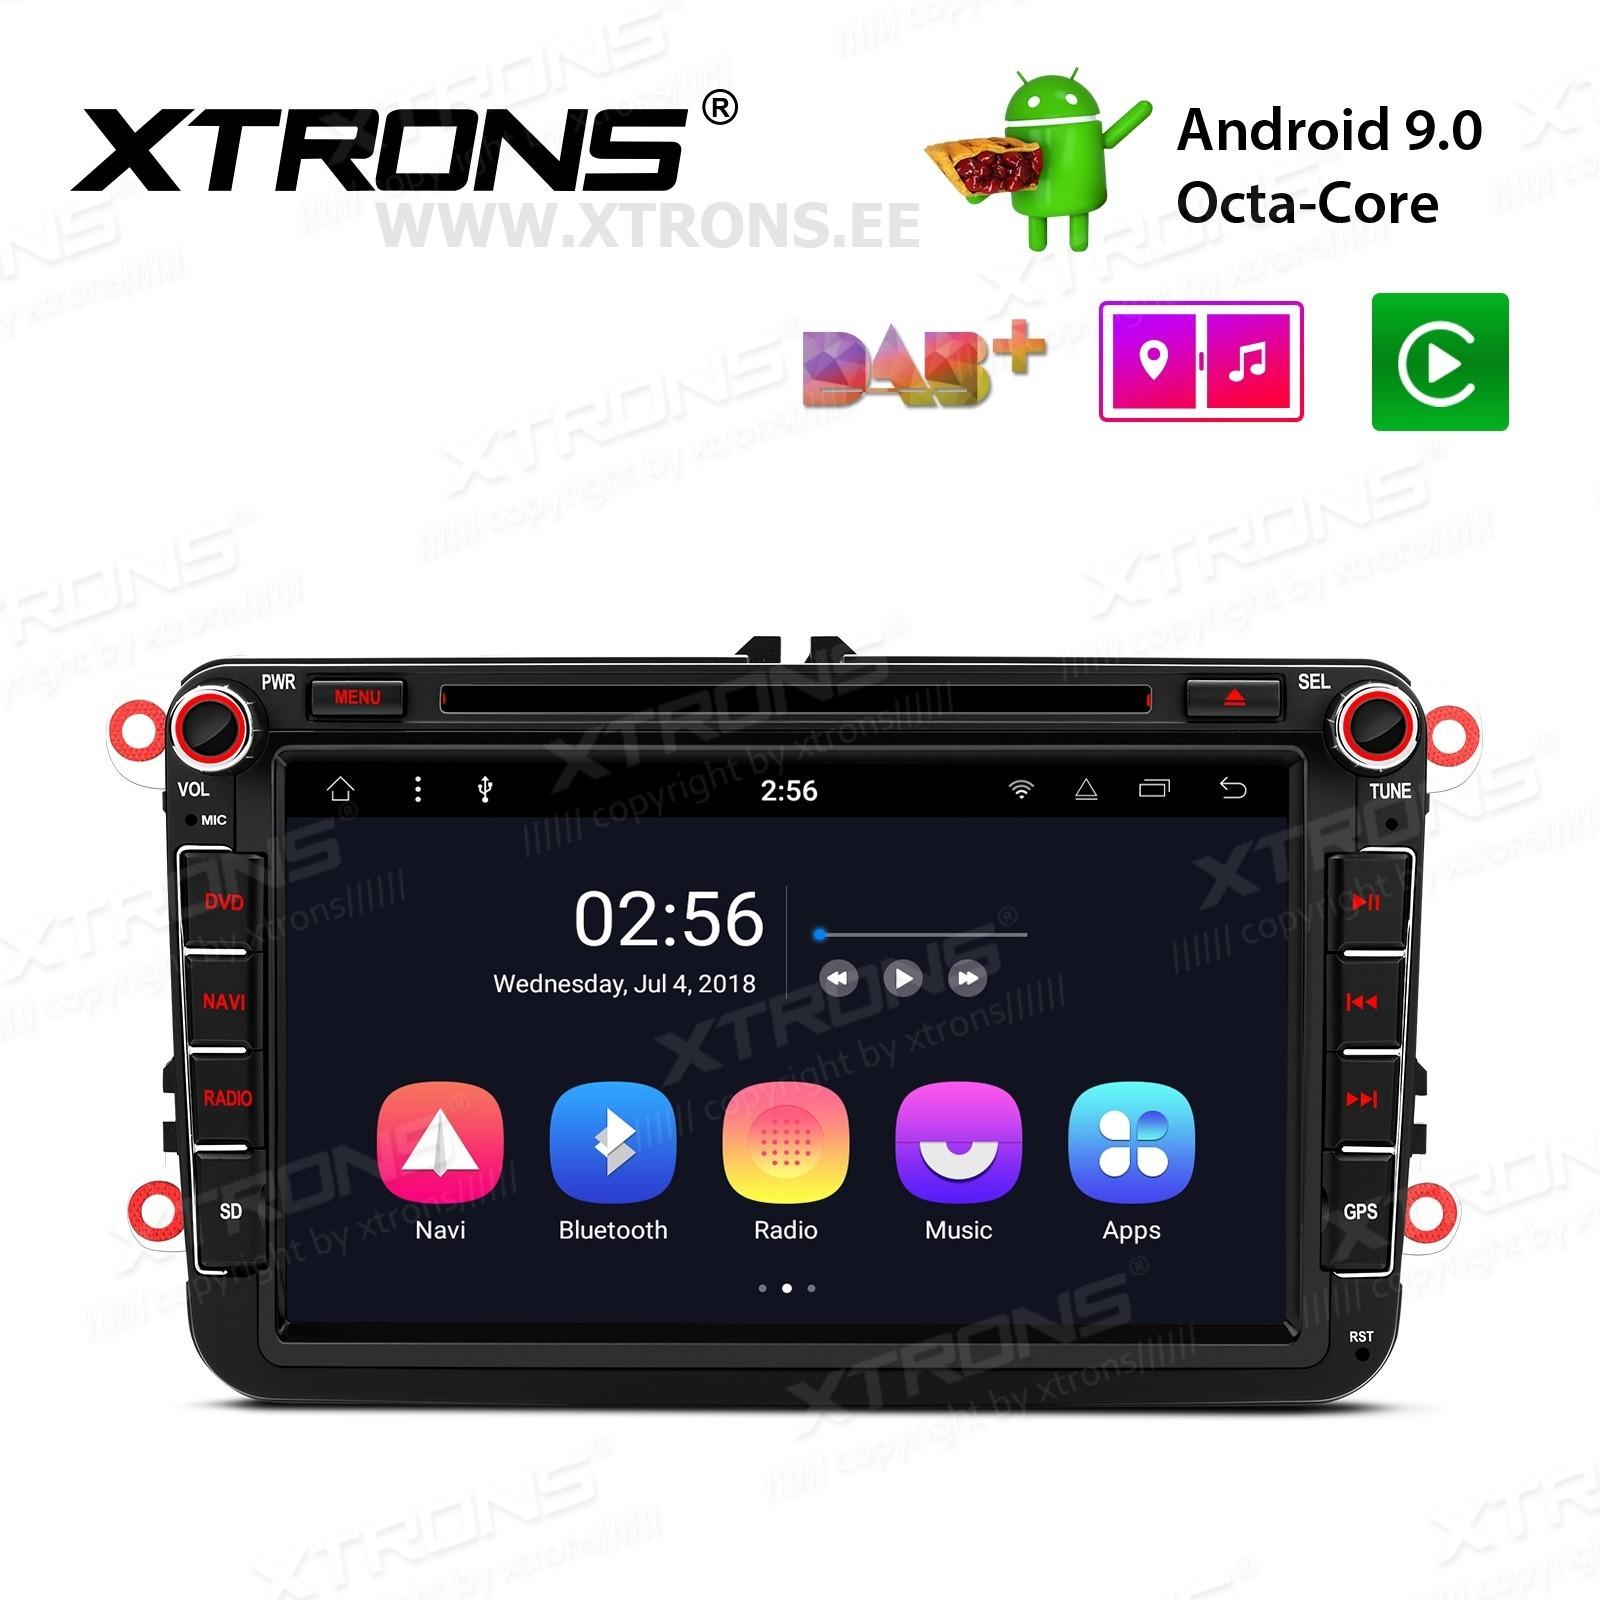 XTRONS PR89MTV